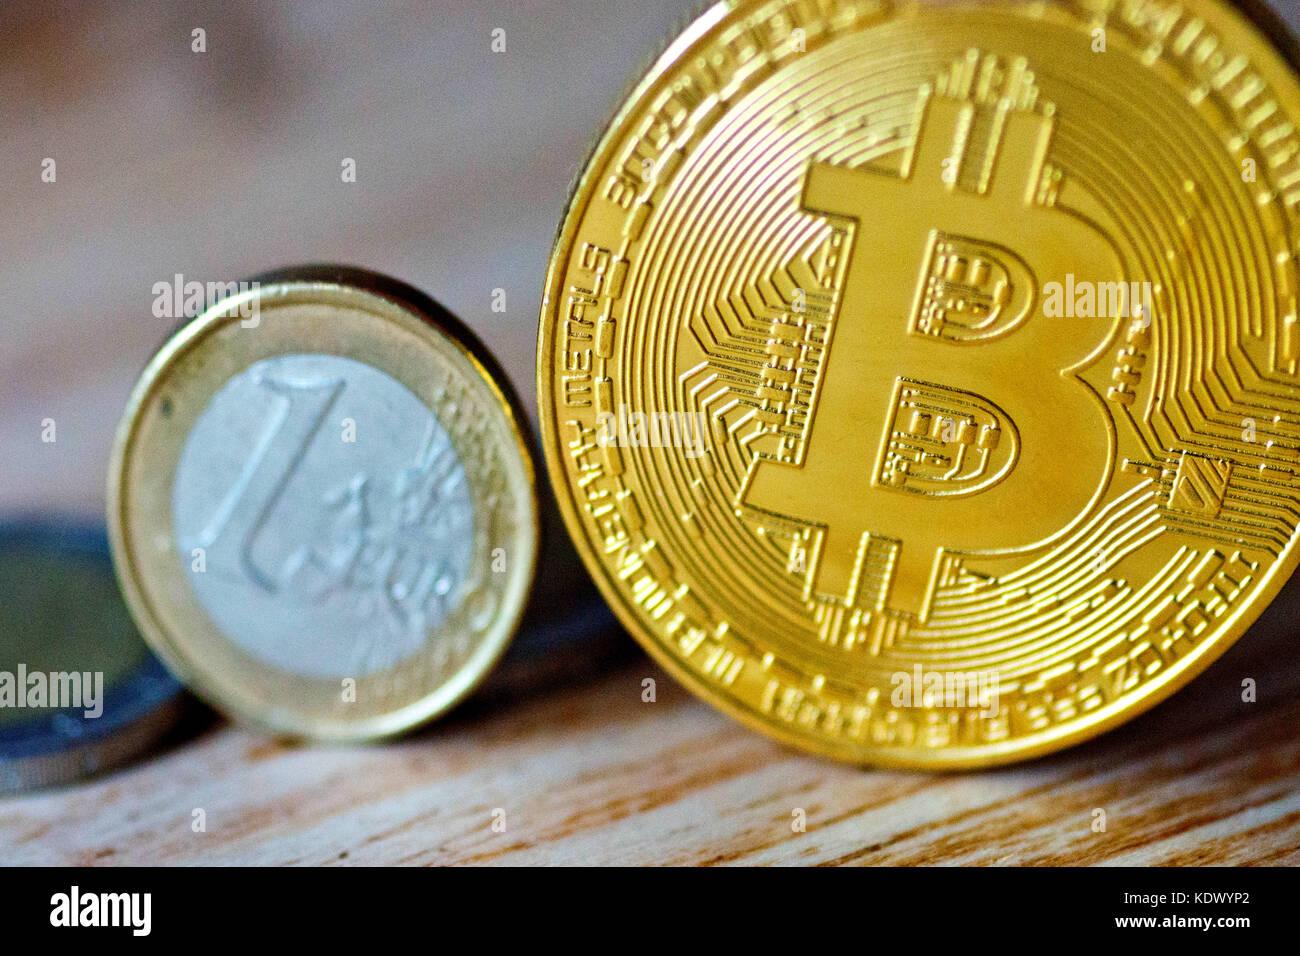 Bitcoin Replica and One Euro coin - Stock Image